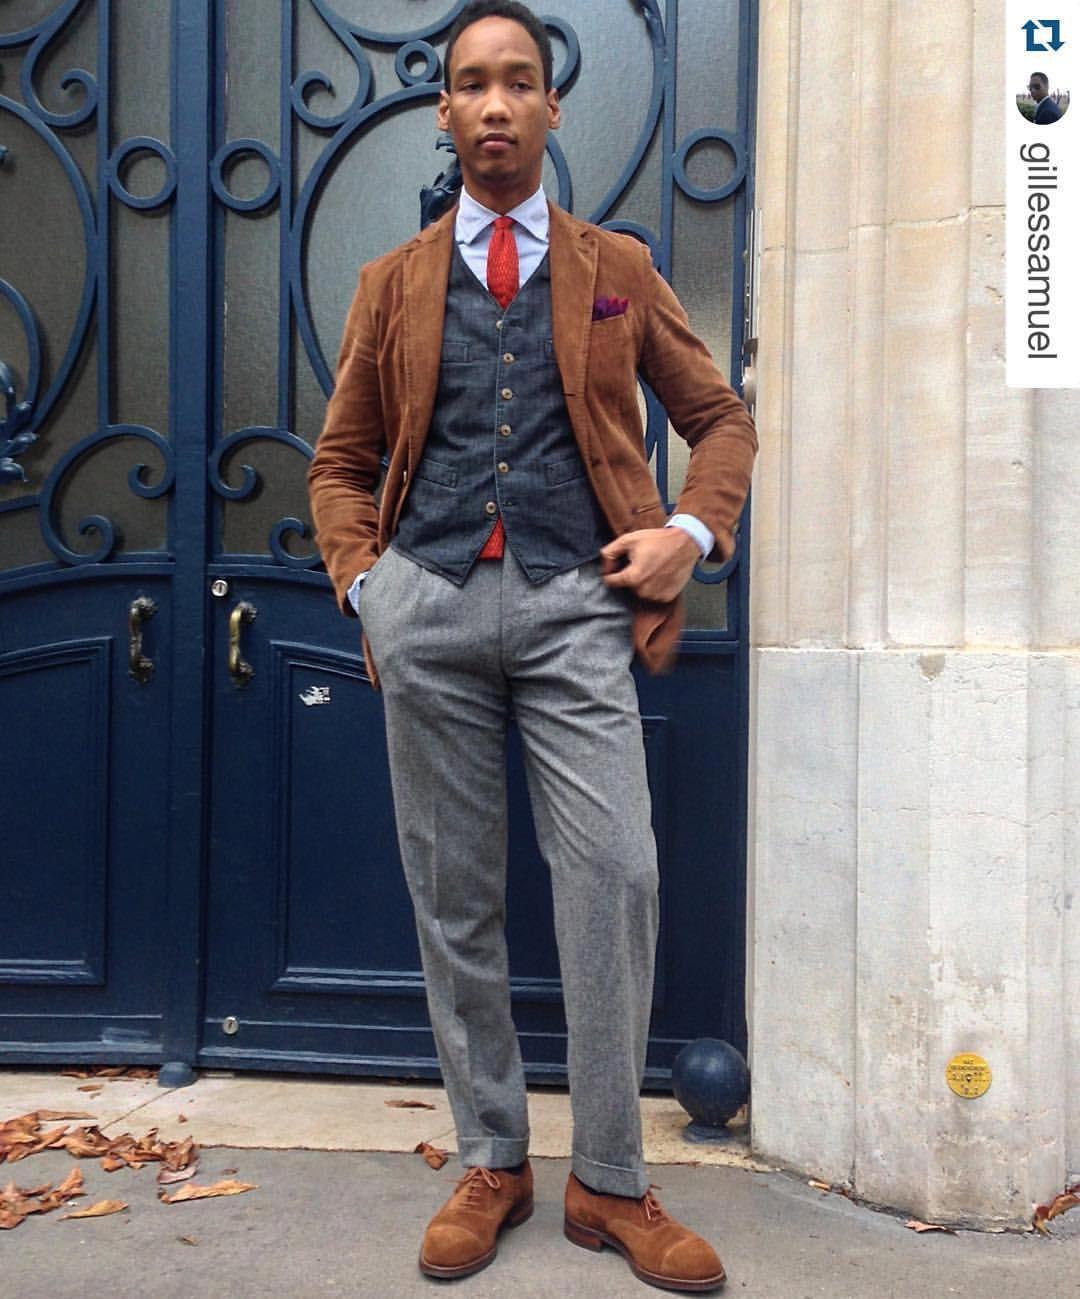 #Repost Gilles Samuel wearing ACE slack jacket in #corduroy Layers mix and match #menswear #mensfashion #menstyle #style #jkeydge #slackjaket #slackmania #mazzarelli #sozzi #scavini #denim #flannel #corduroy #citizenkeydge